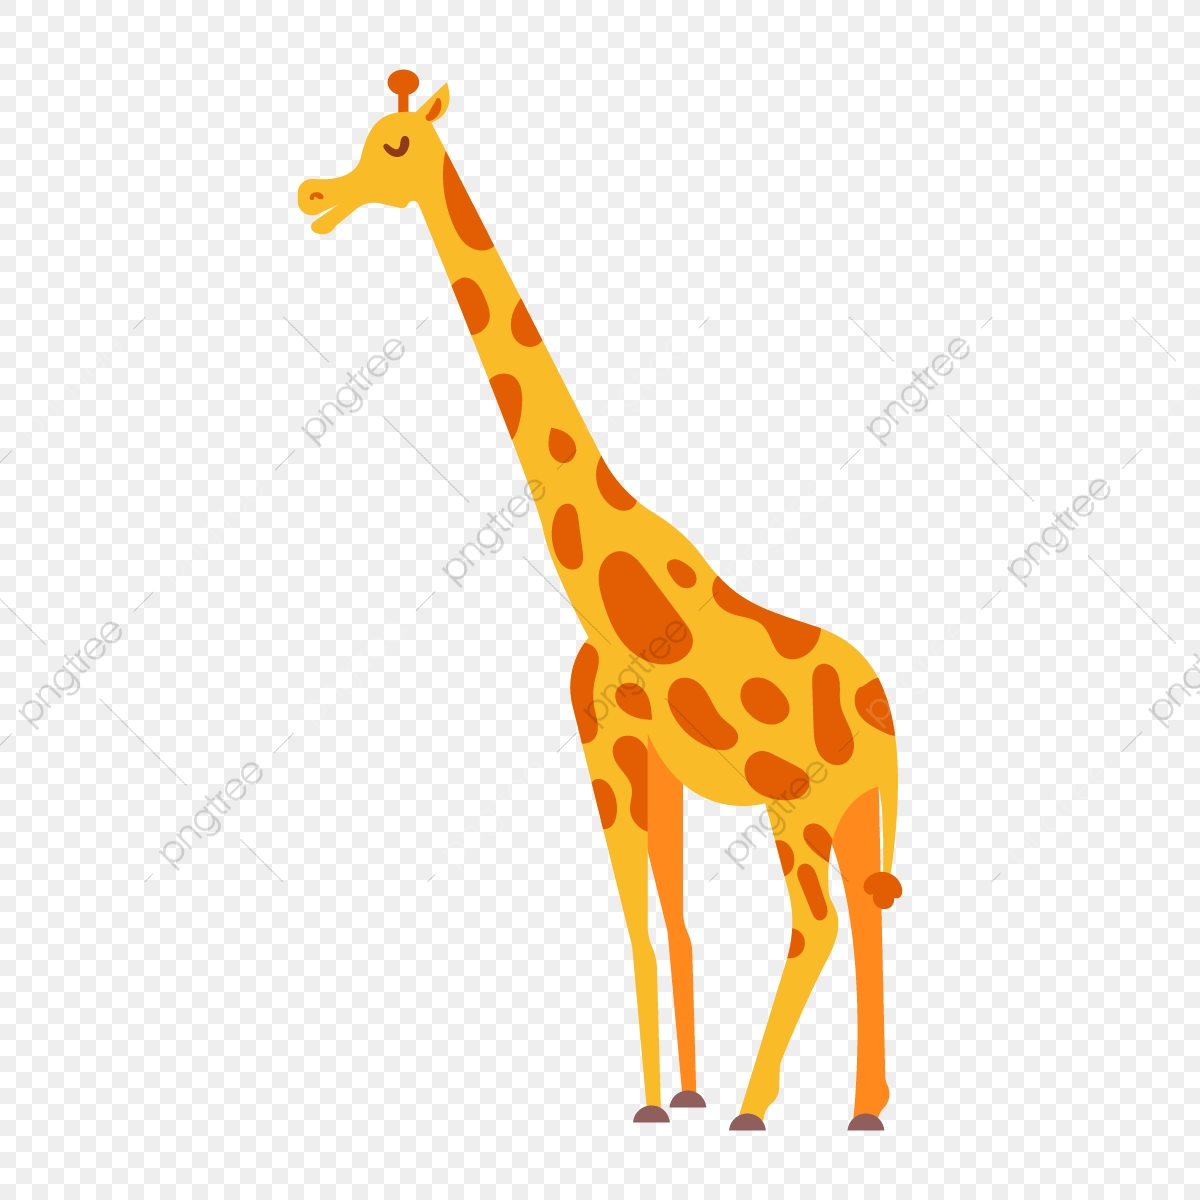 Girafa Dos Desenhos Animados Ilustracao Isolado Icon Png E